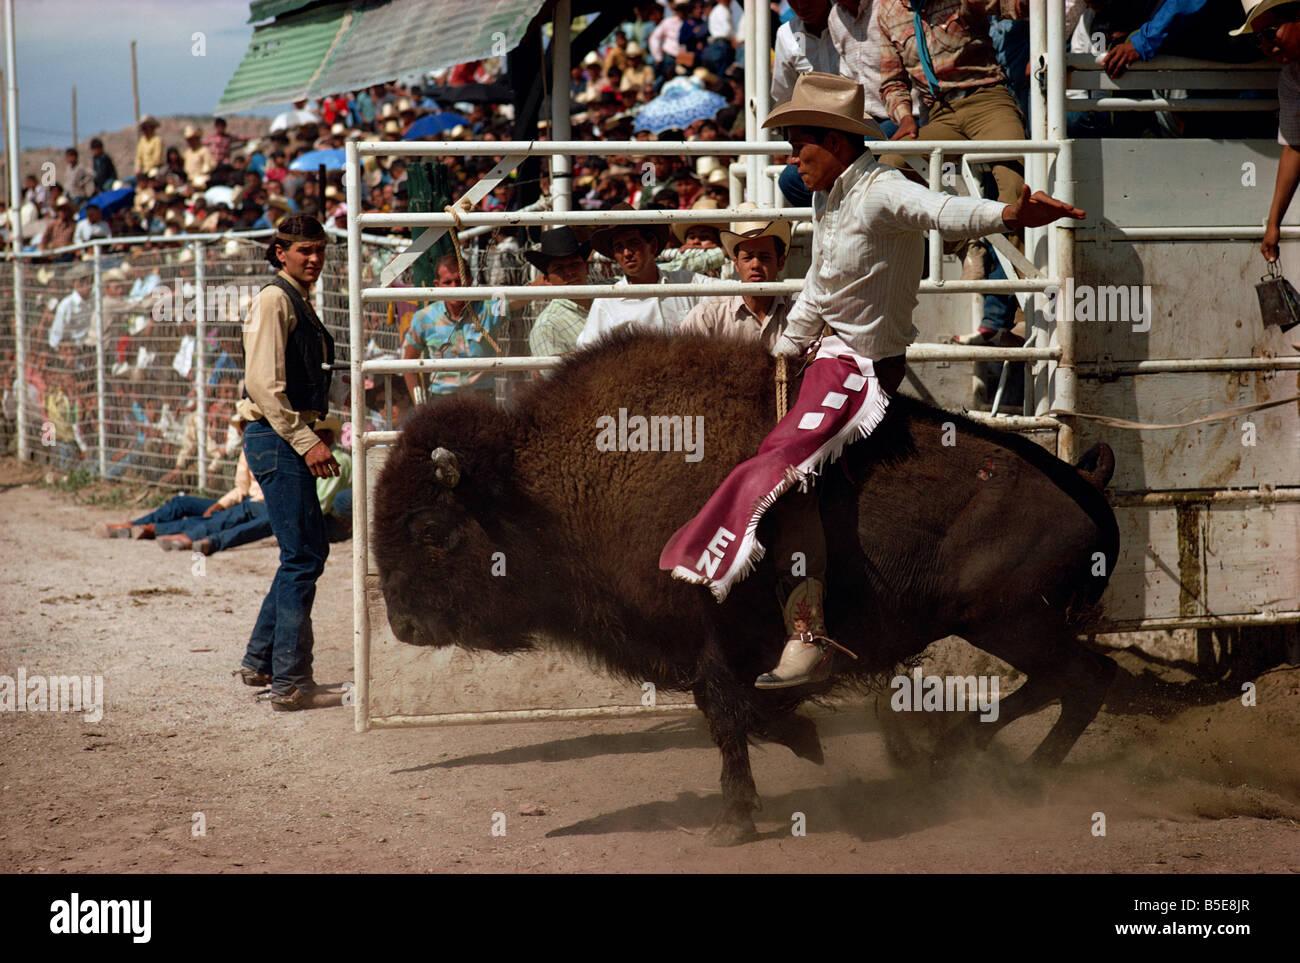 Rodeo Riding Gallup New Mexico Usa North America Stock